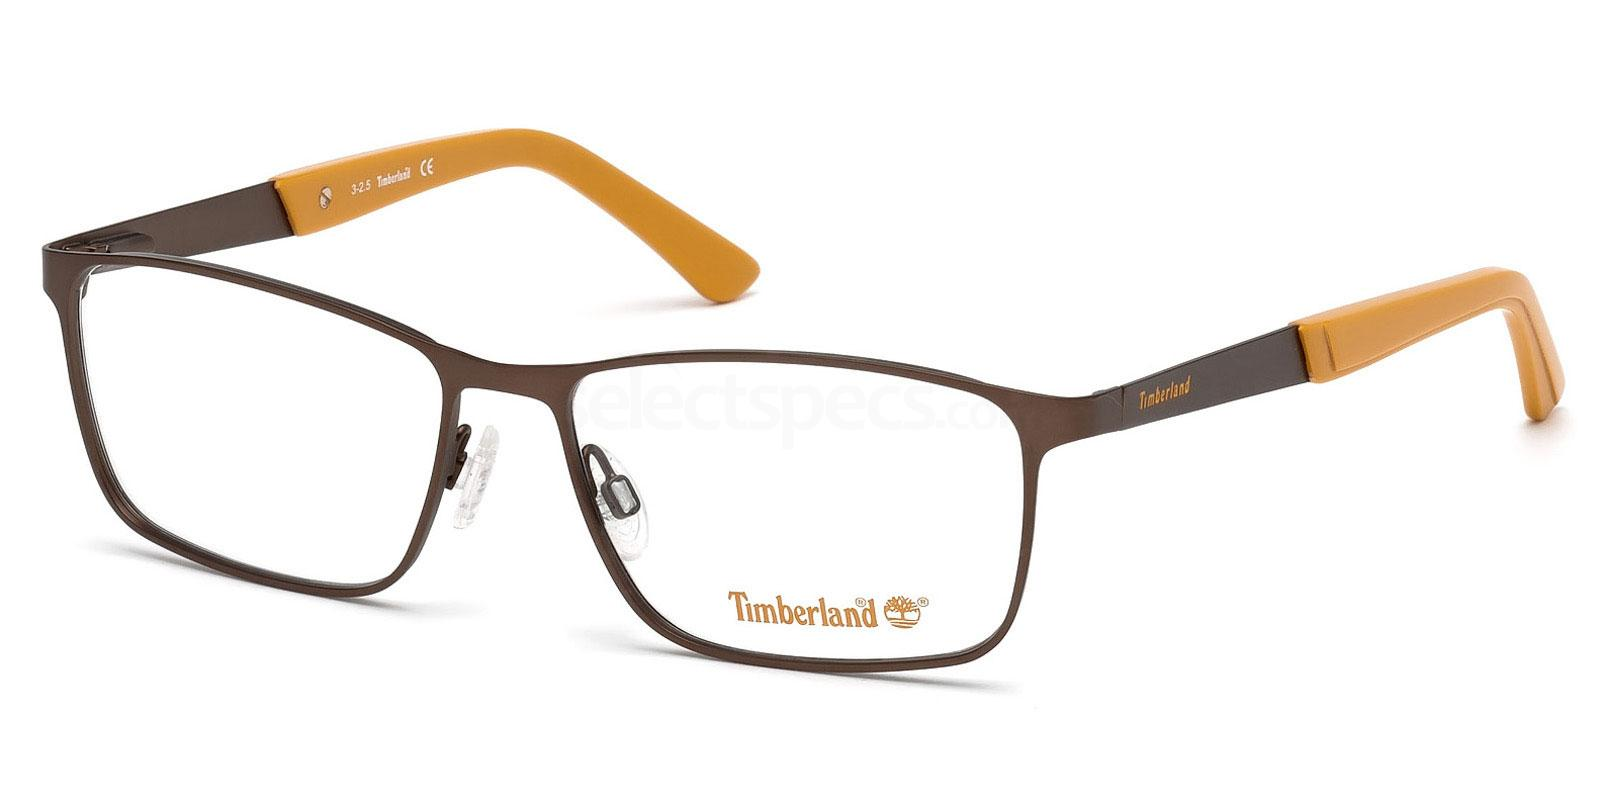 037 TB1359 Glasses, Timberland